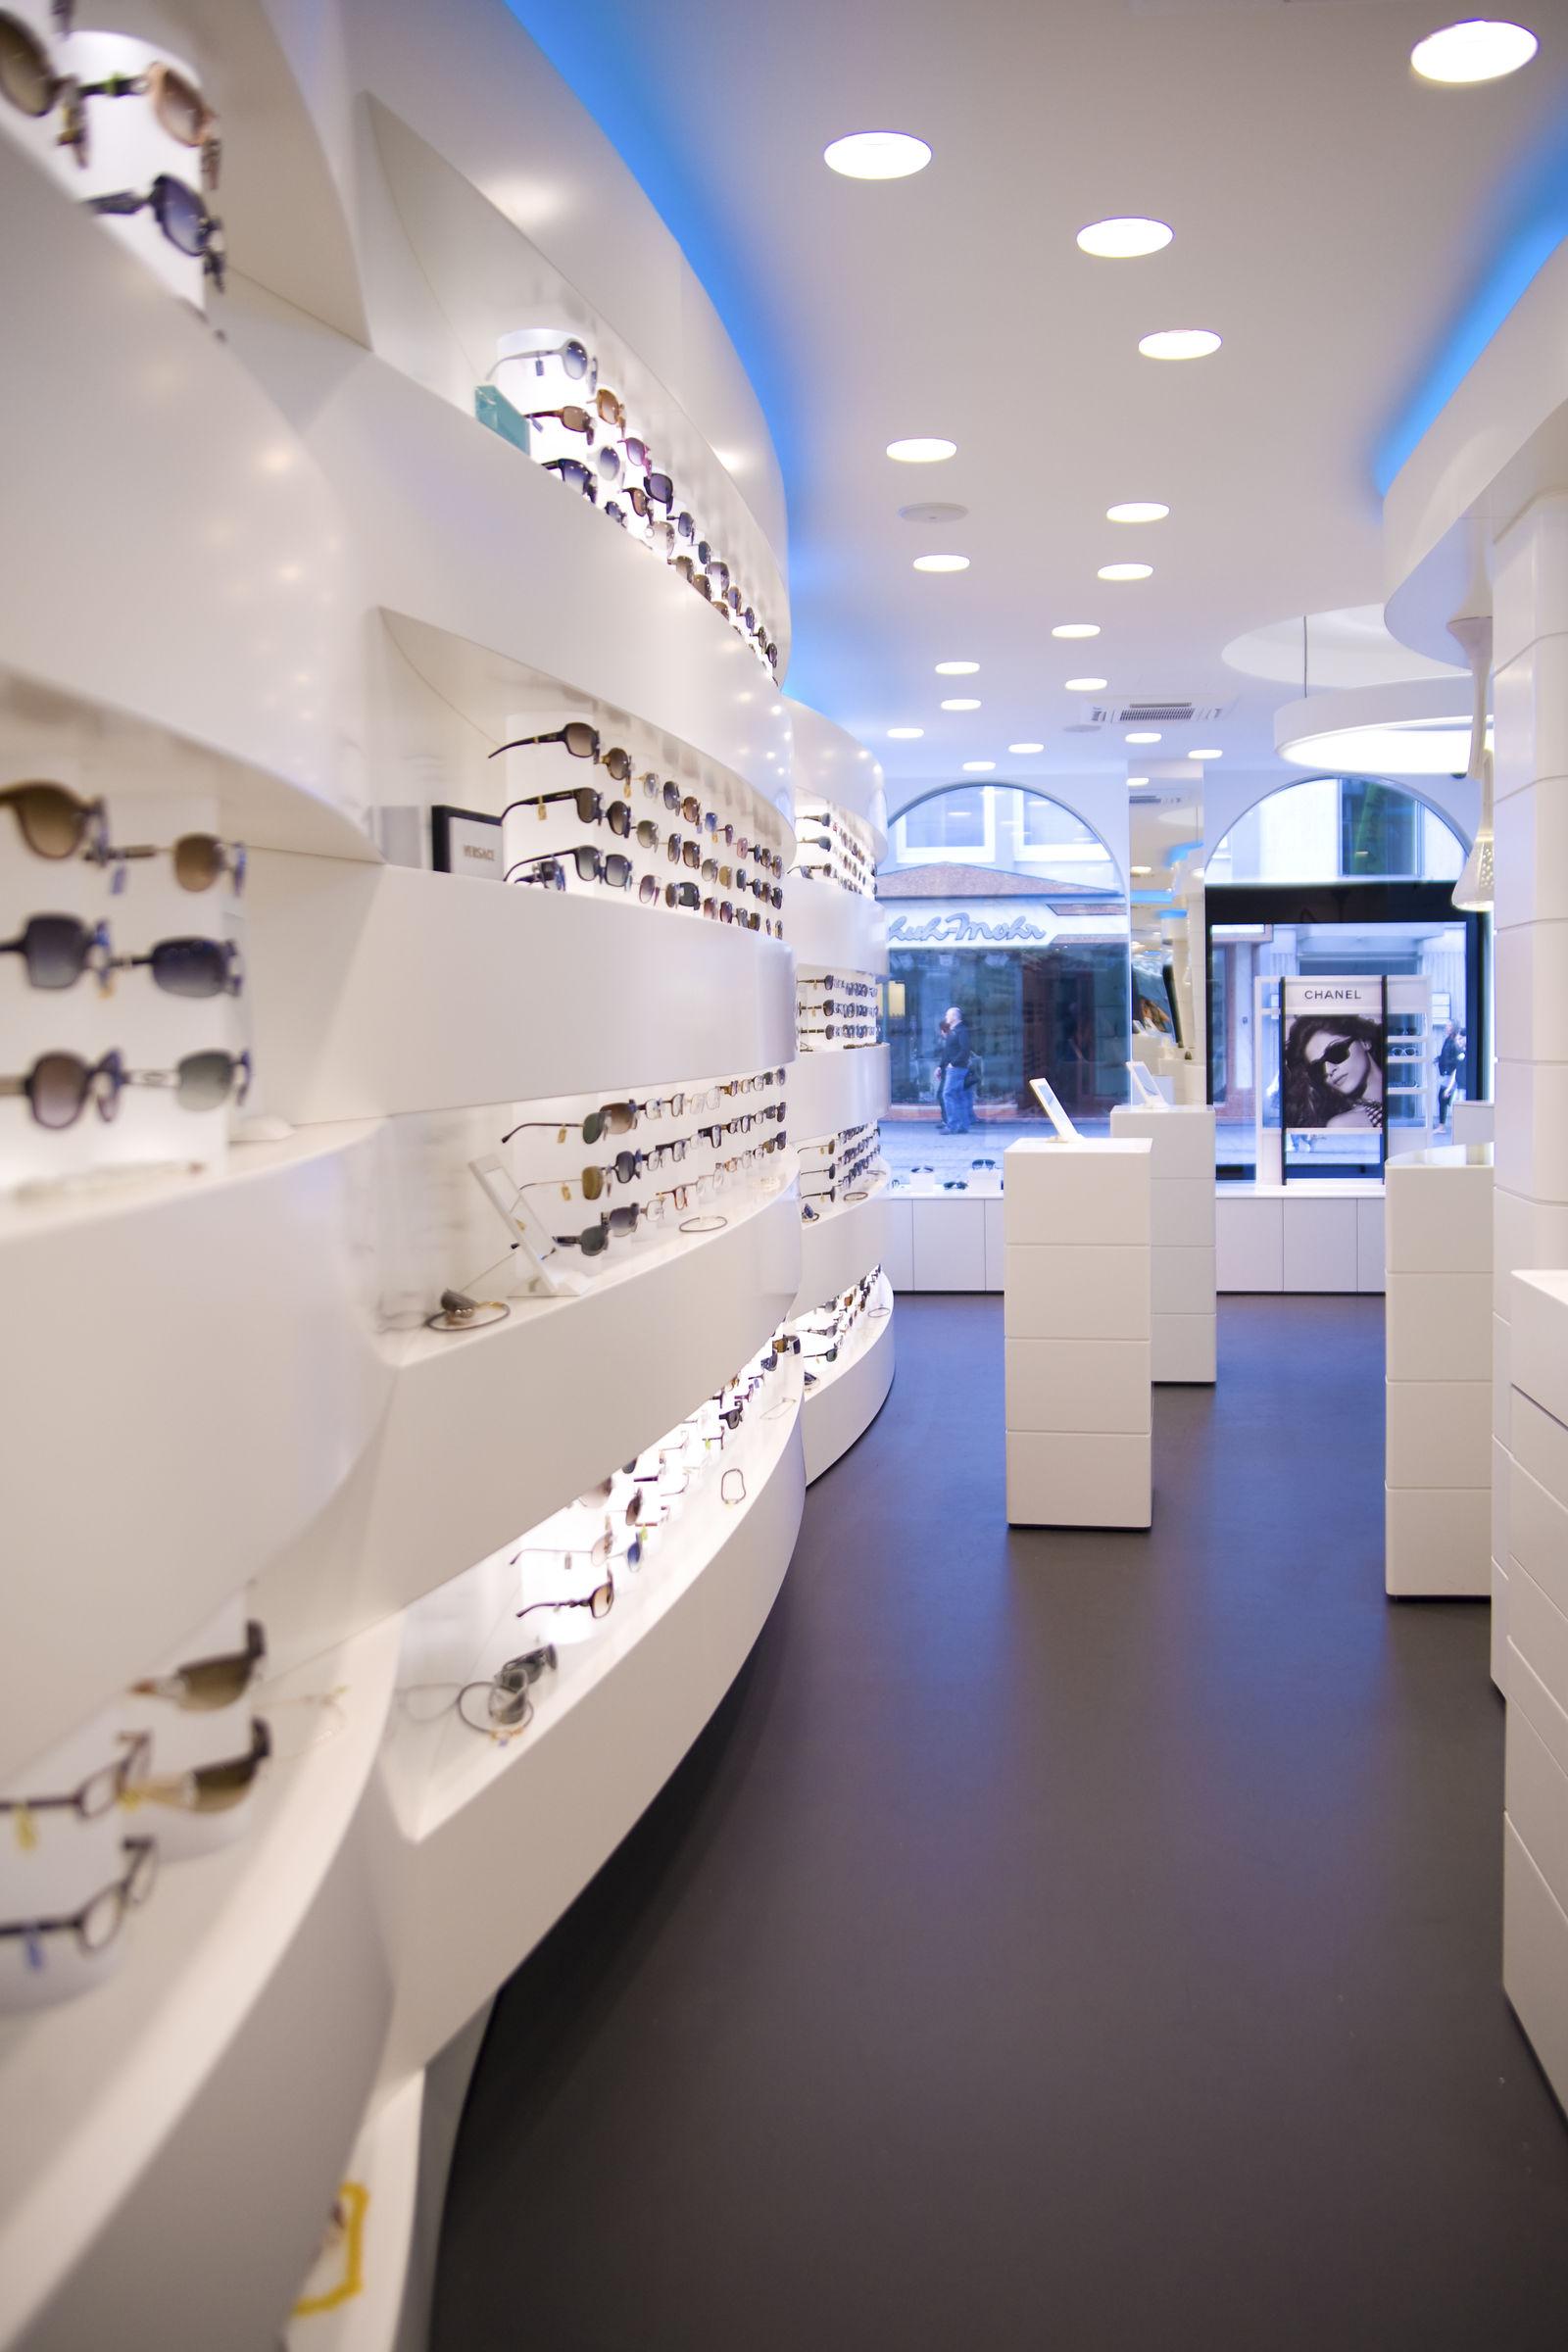 Kresinsky - brillen.kontaktlinsen.hörgeräte in Würzburg (Bild 11)